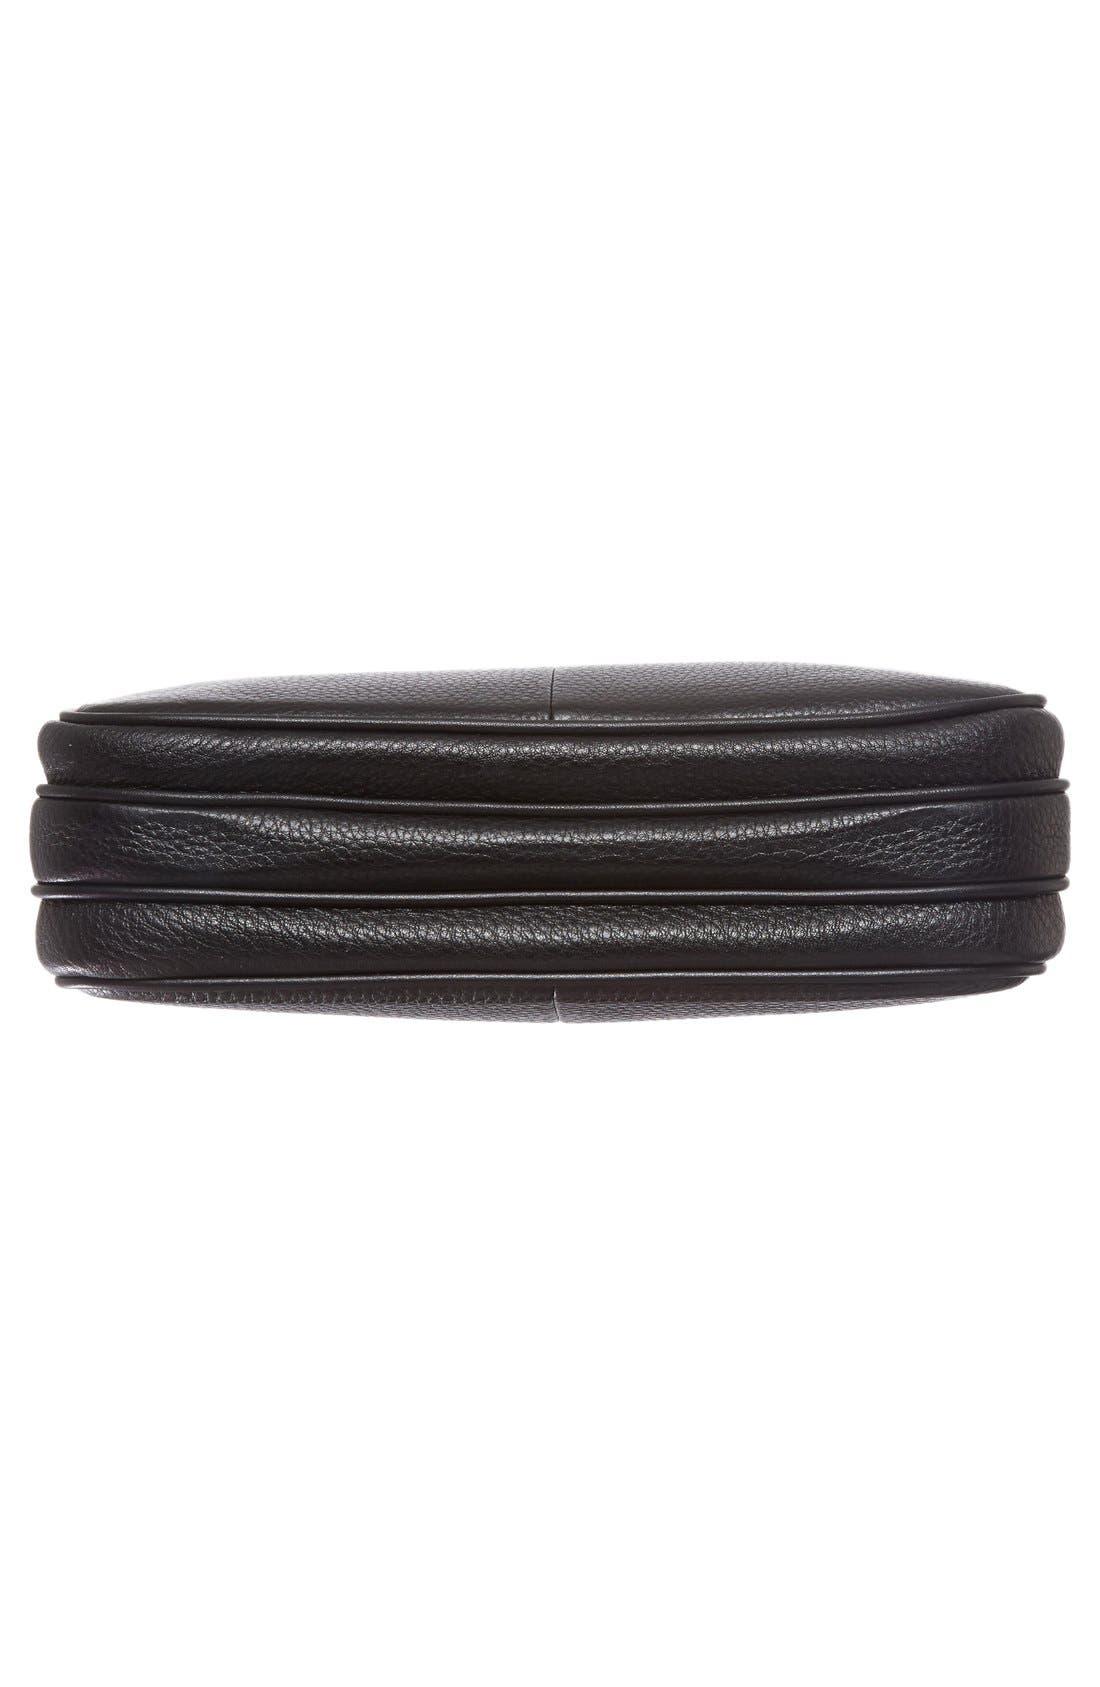 Ivy Leather Crossbody Bag,                             Alternate thumbnail 7, color,                             001